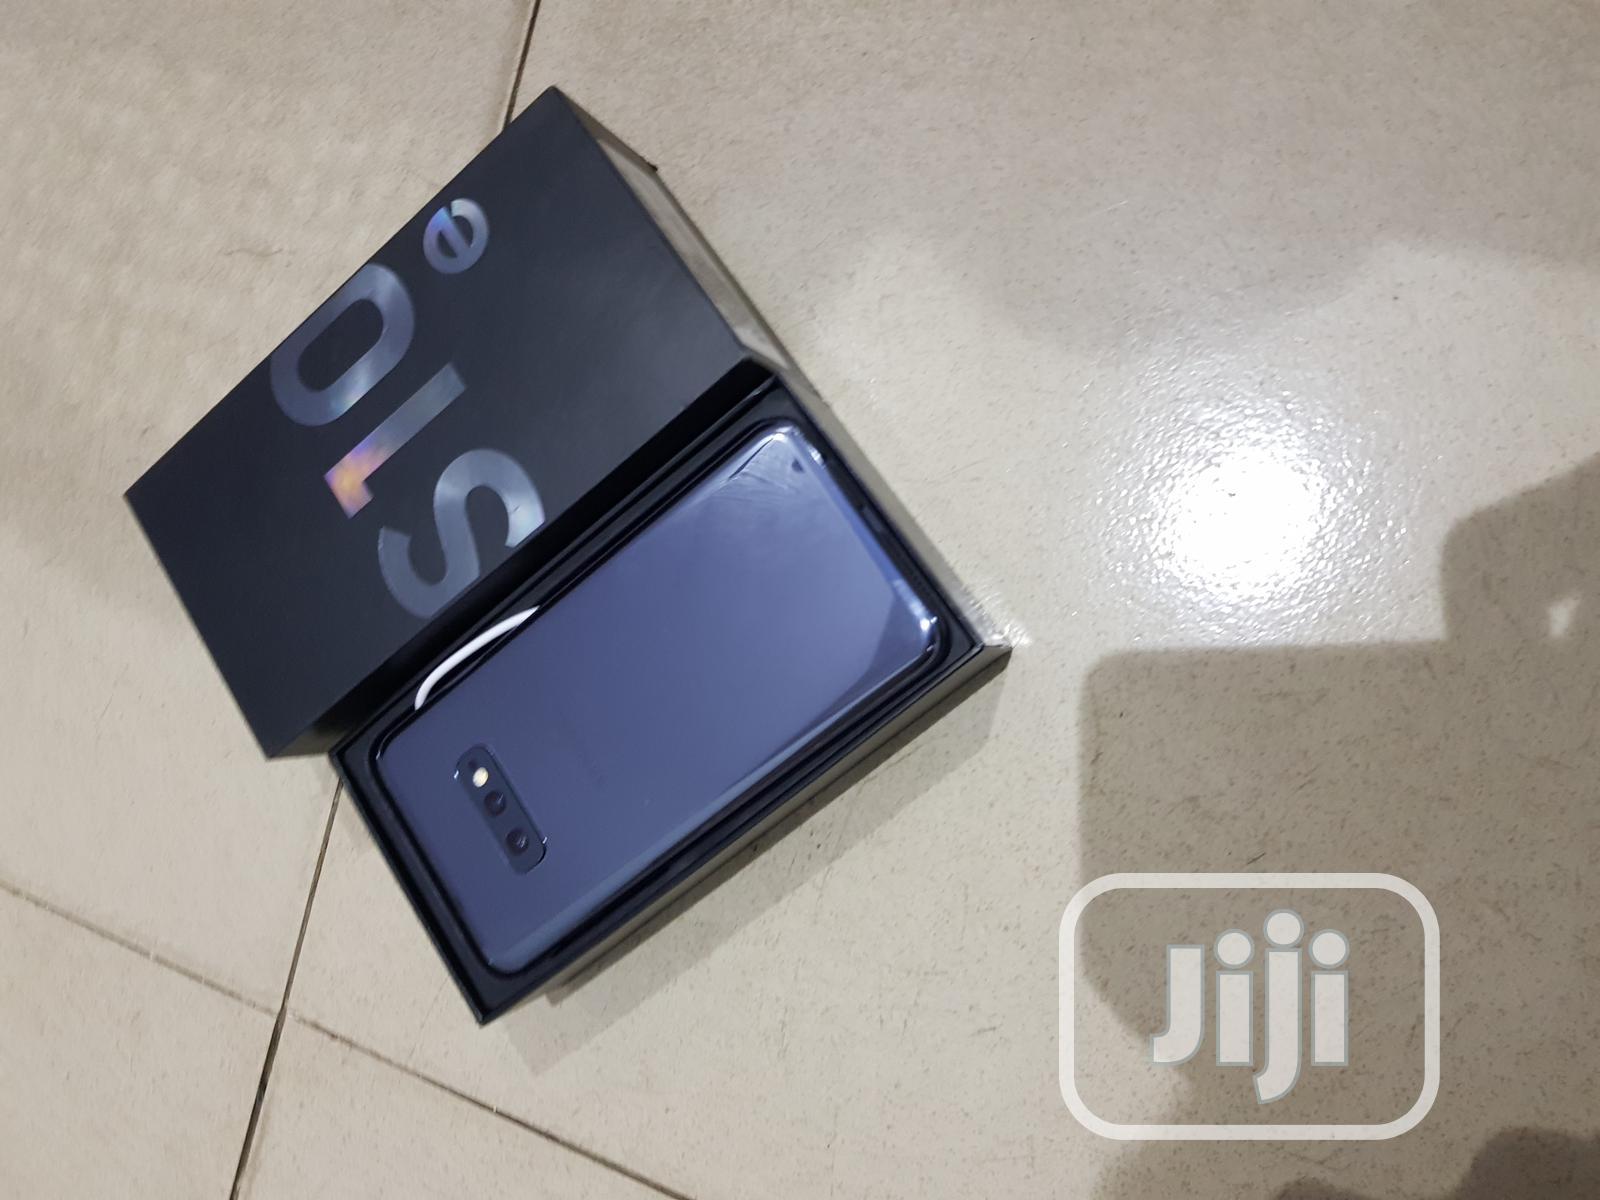 Samsung Galaxy S10e 128 GB Gray | Mobile Phones for sale in Ibadan, Oyo State, Nigeria